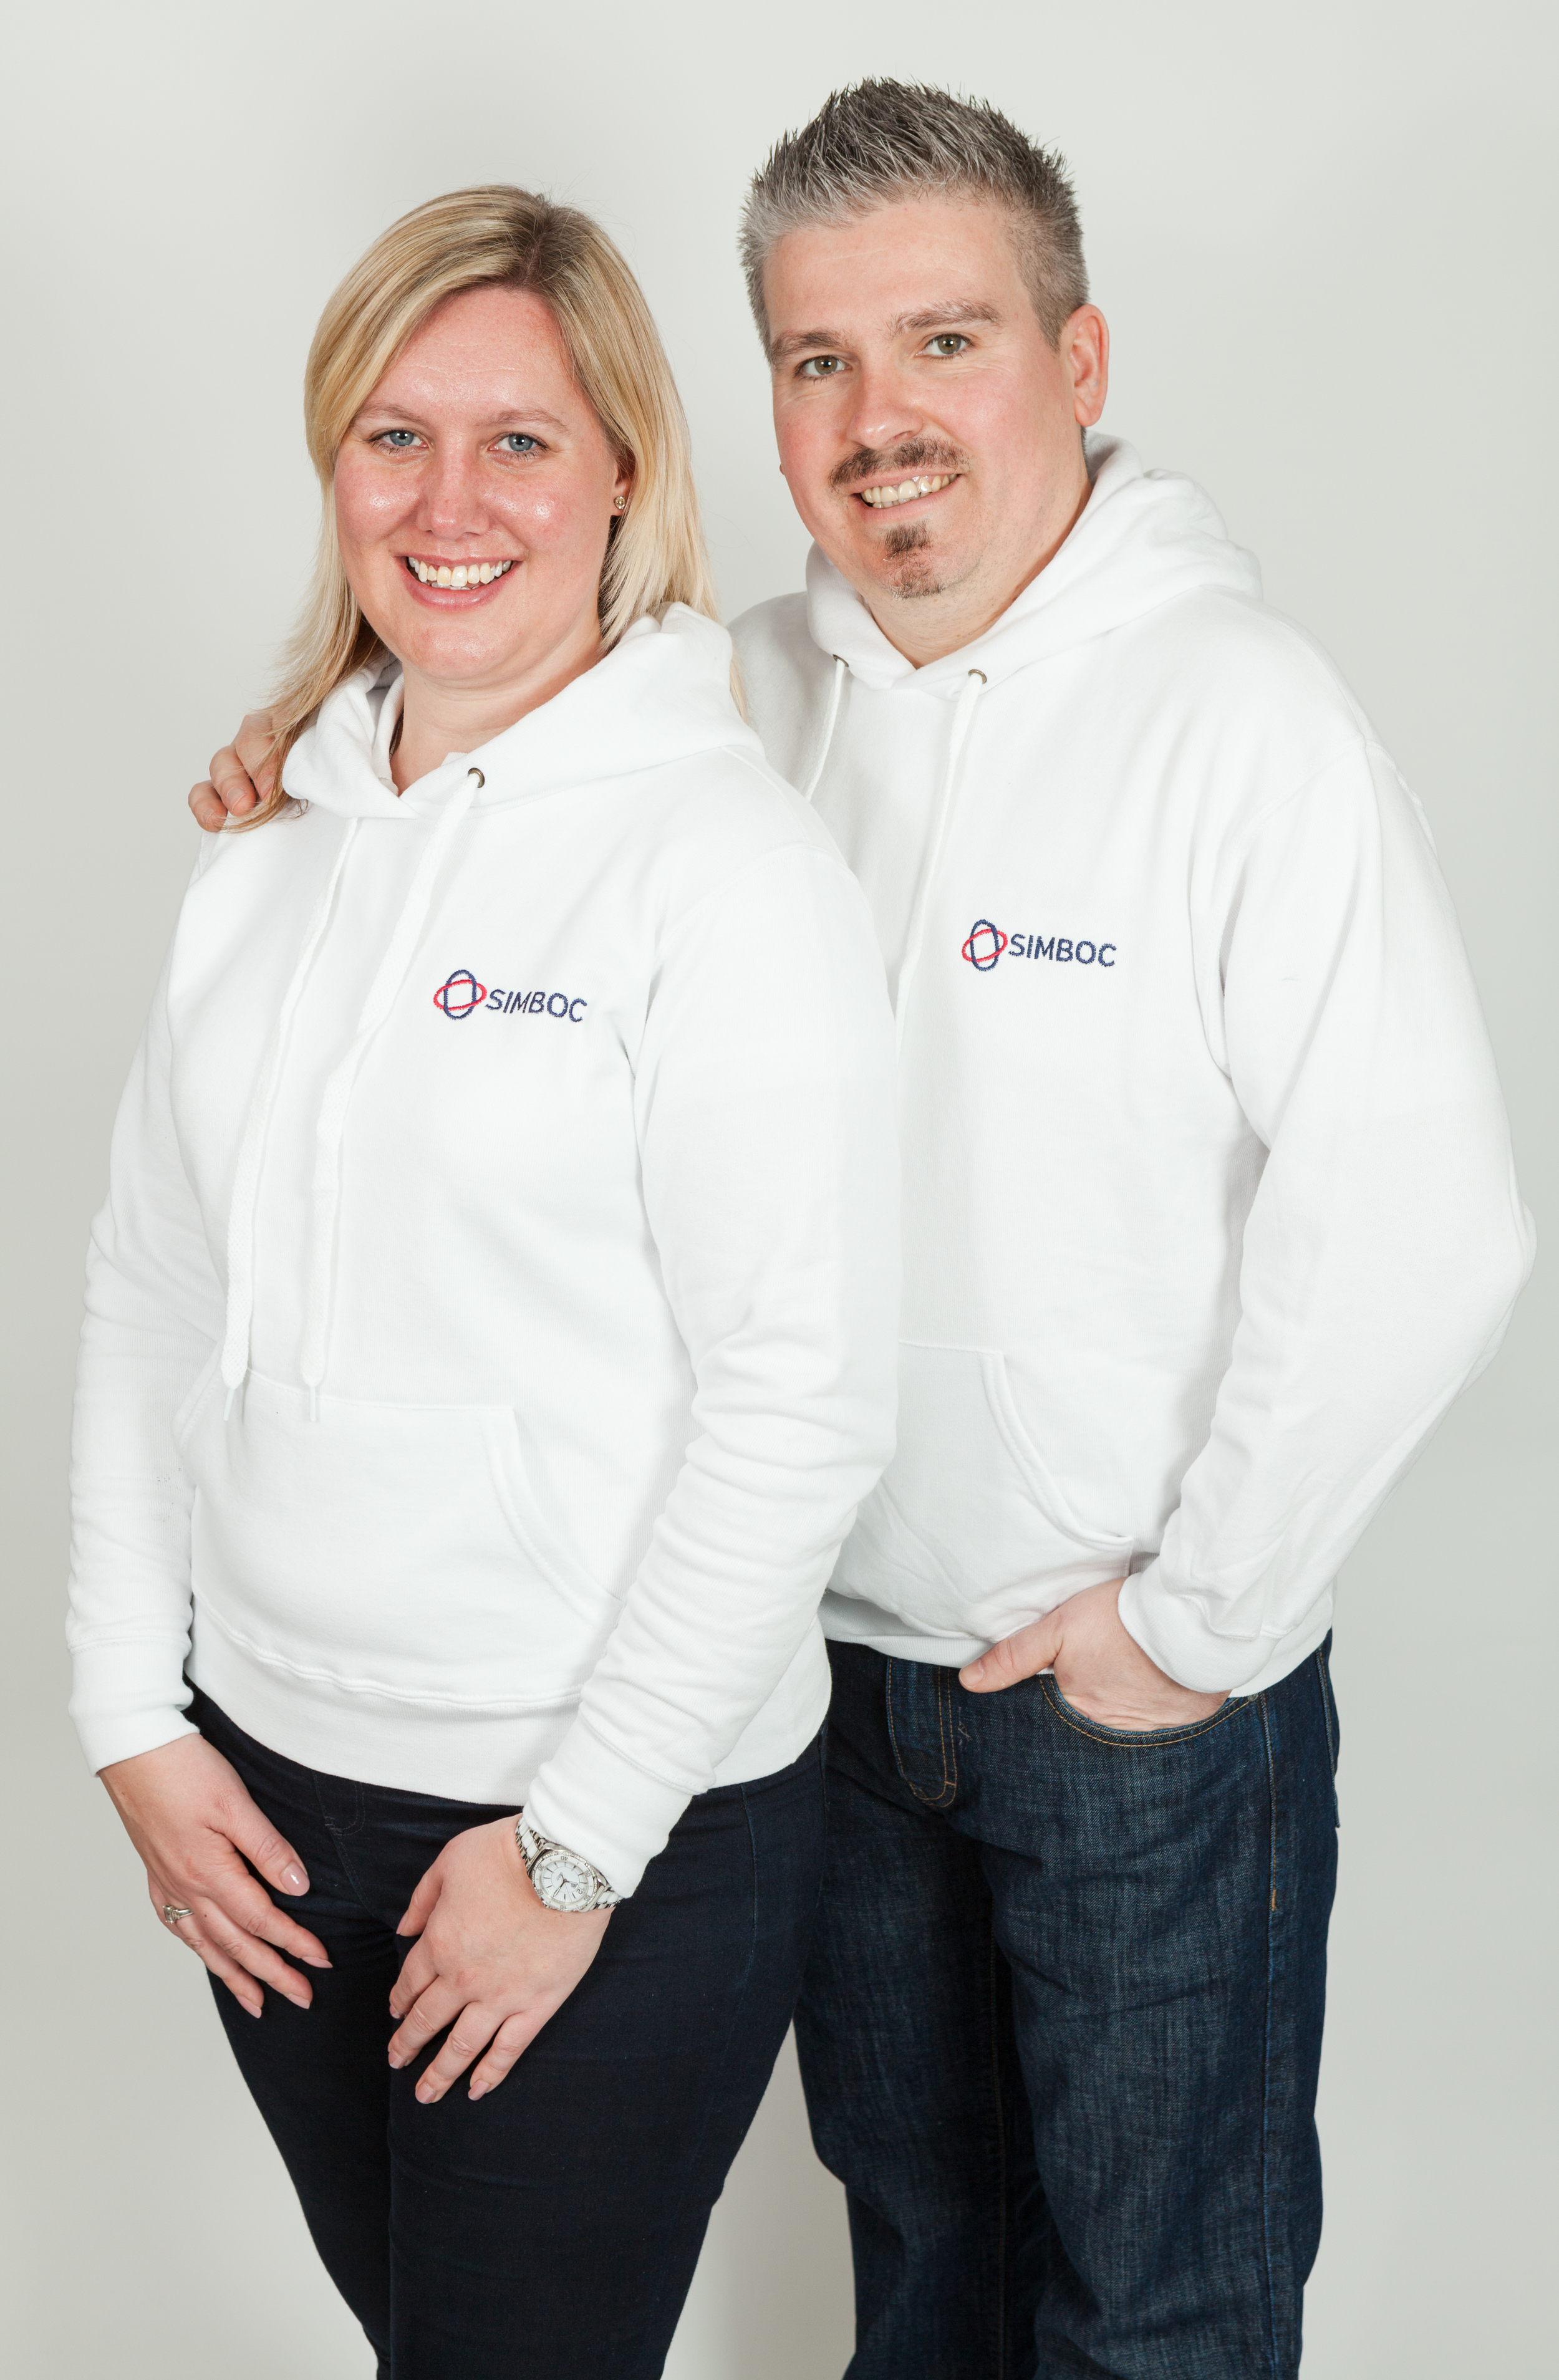 Jo and Dave - Simboc Hoddies_SimbocLtd_6337.jpg